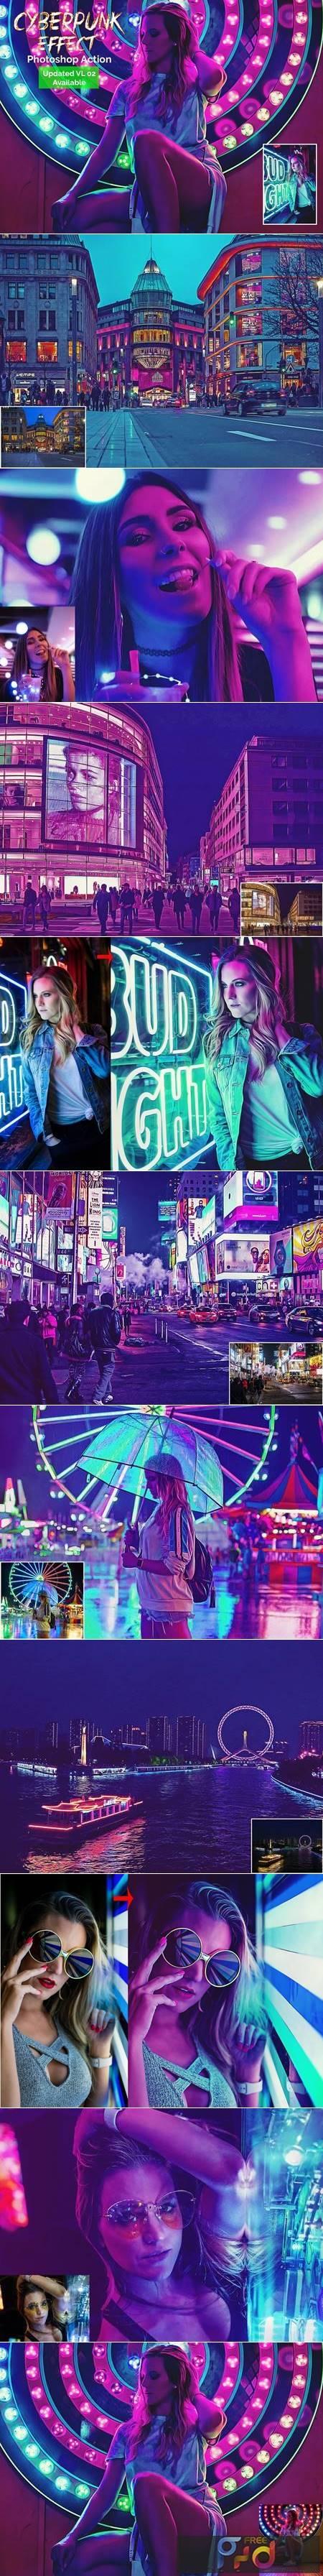 Cyberpunk Effect Photoshop Action 5106456 1